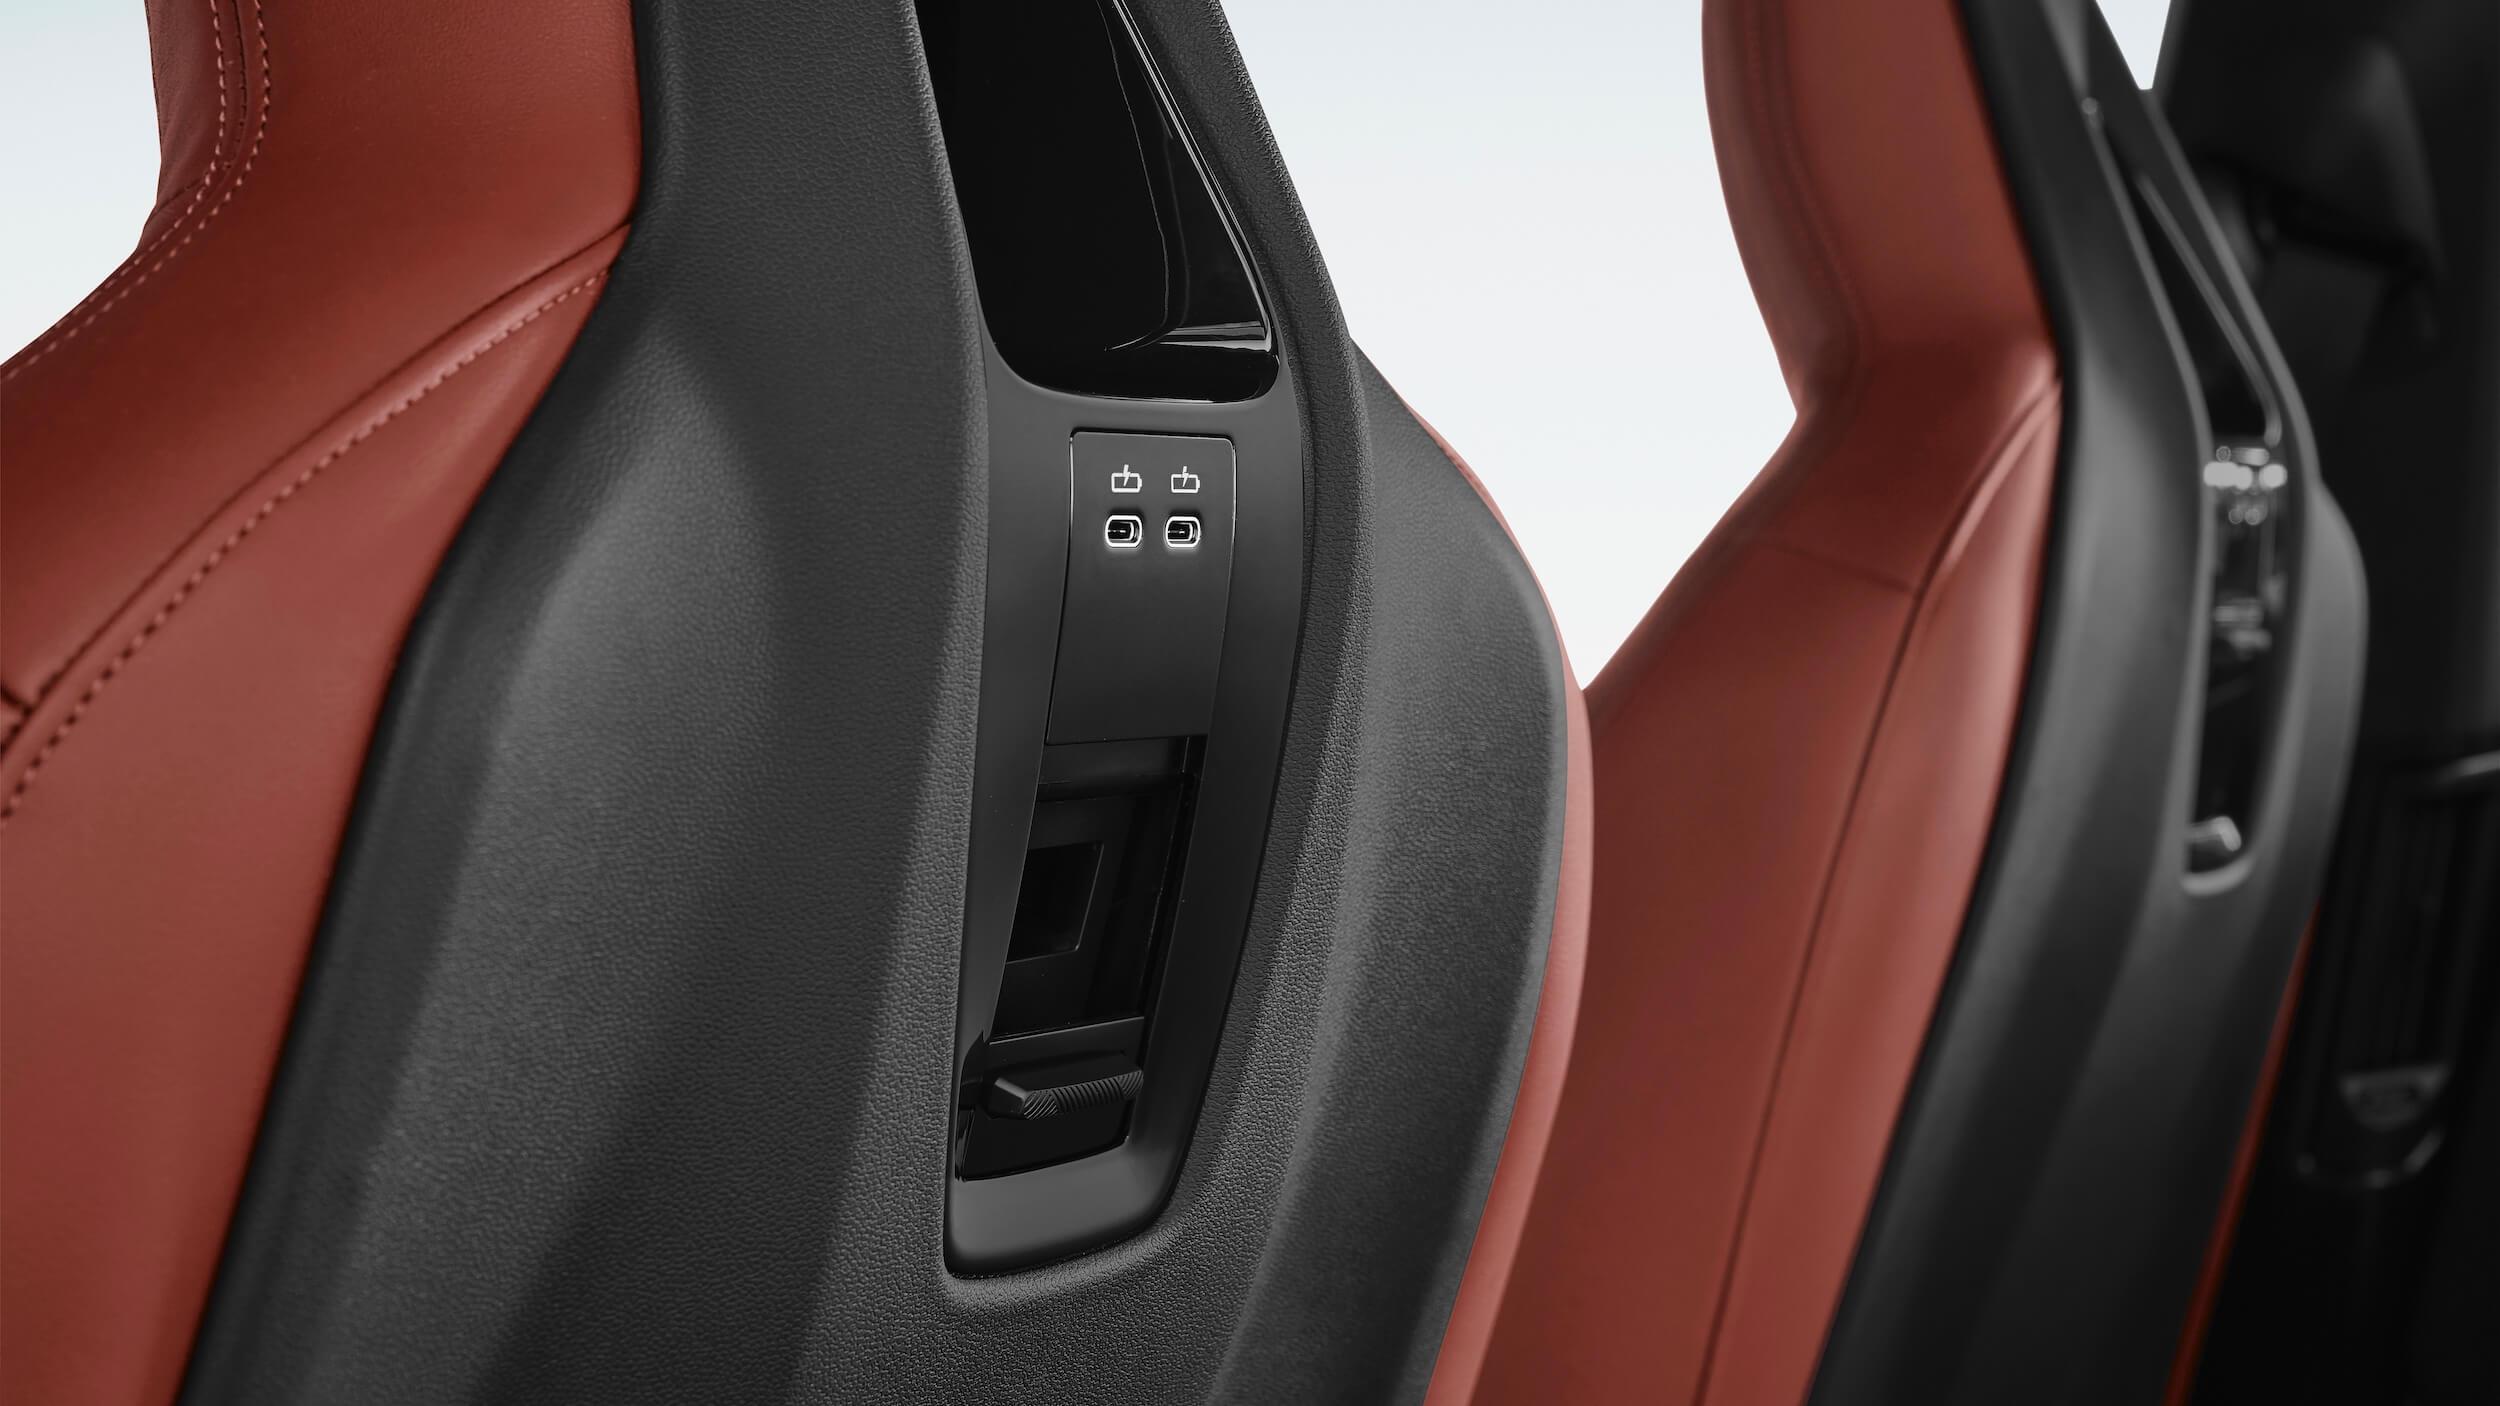 BMW iX USB poort zetels